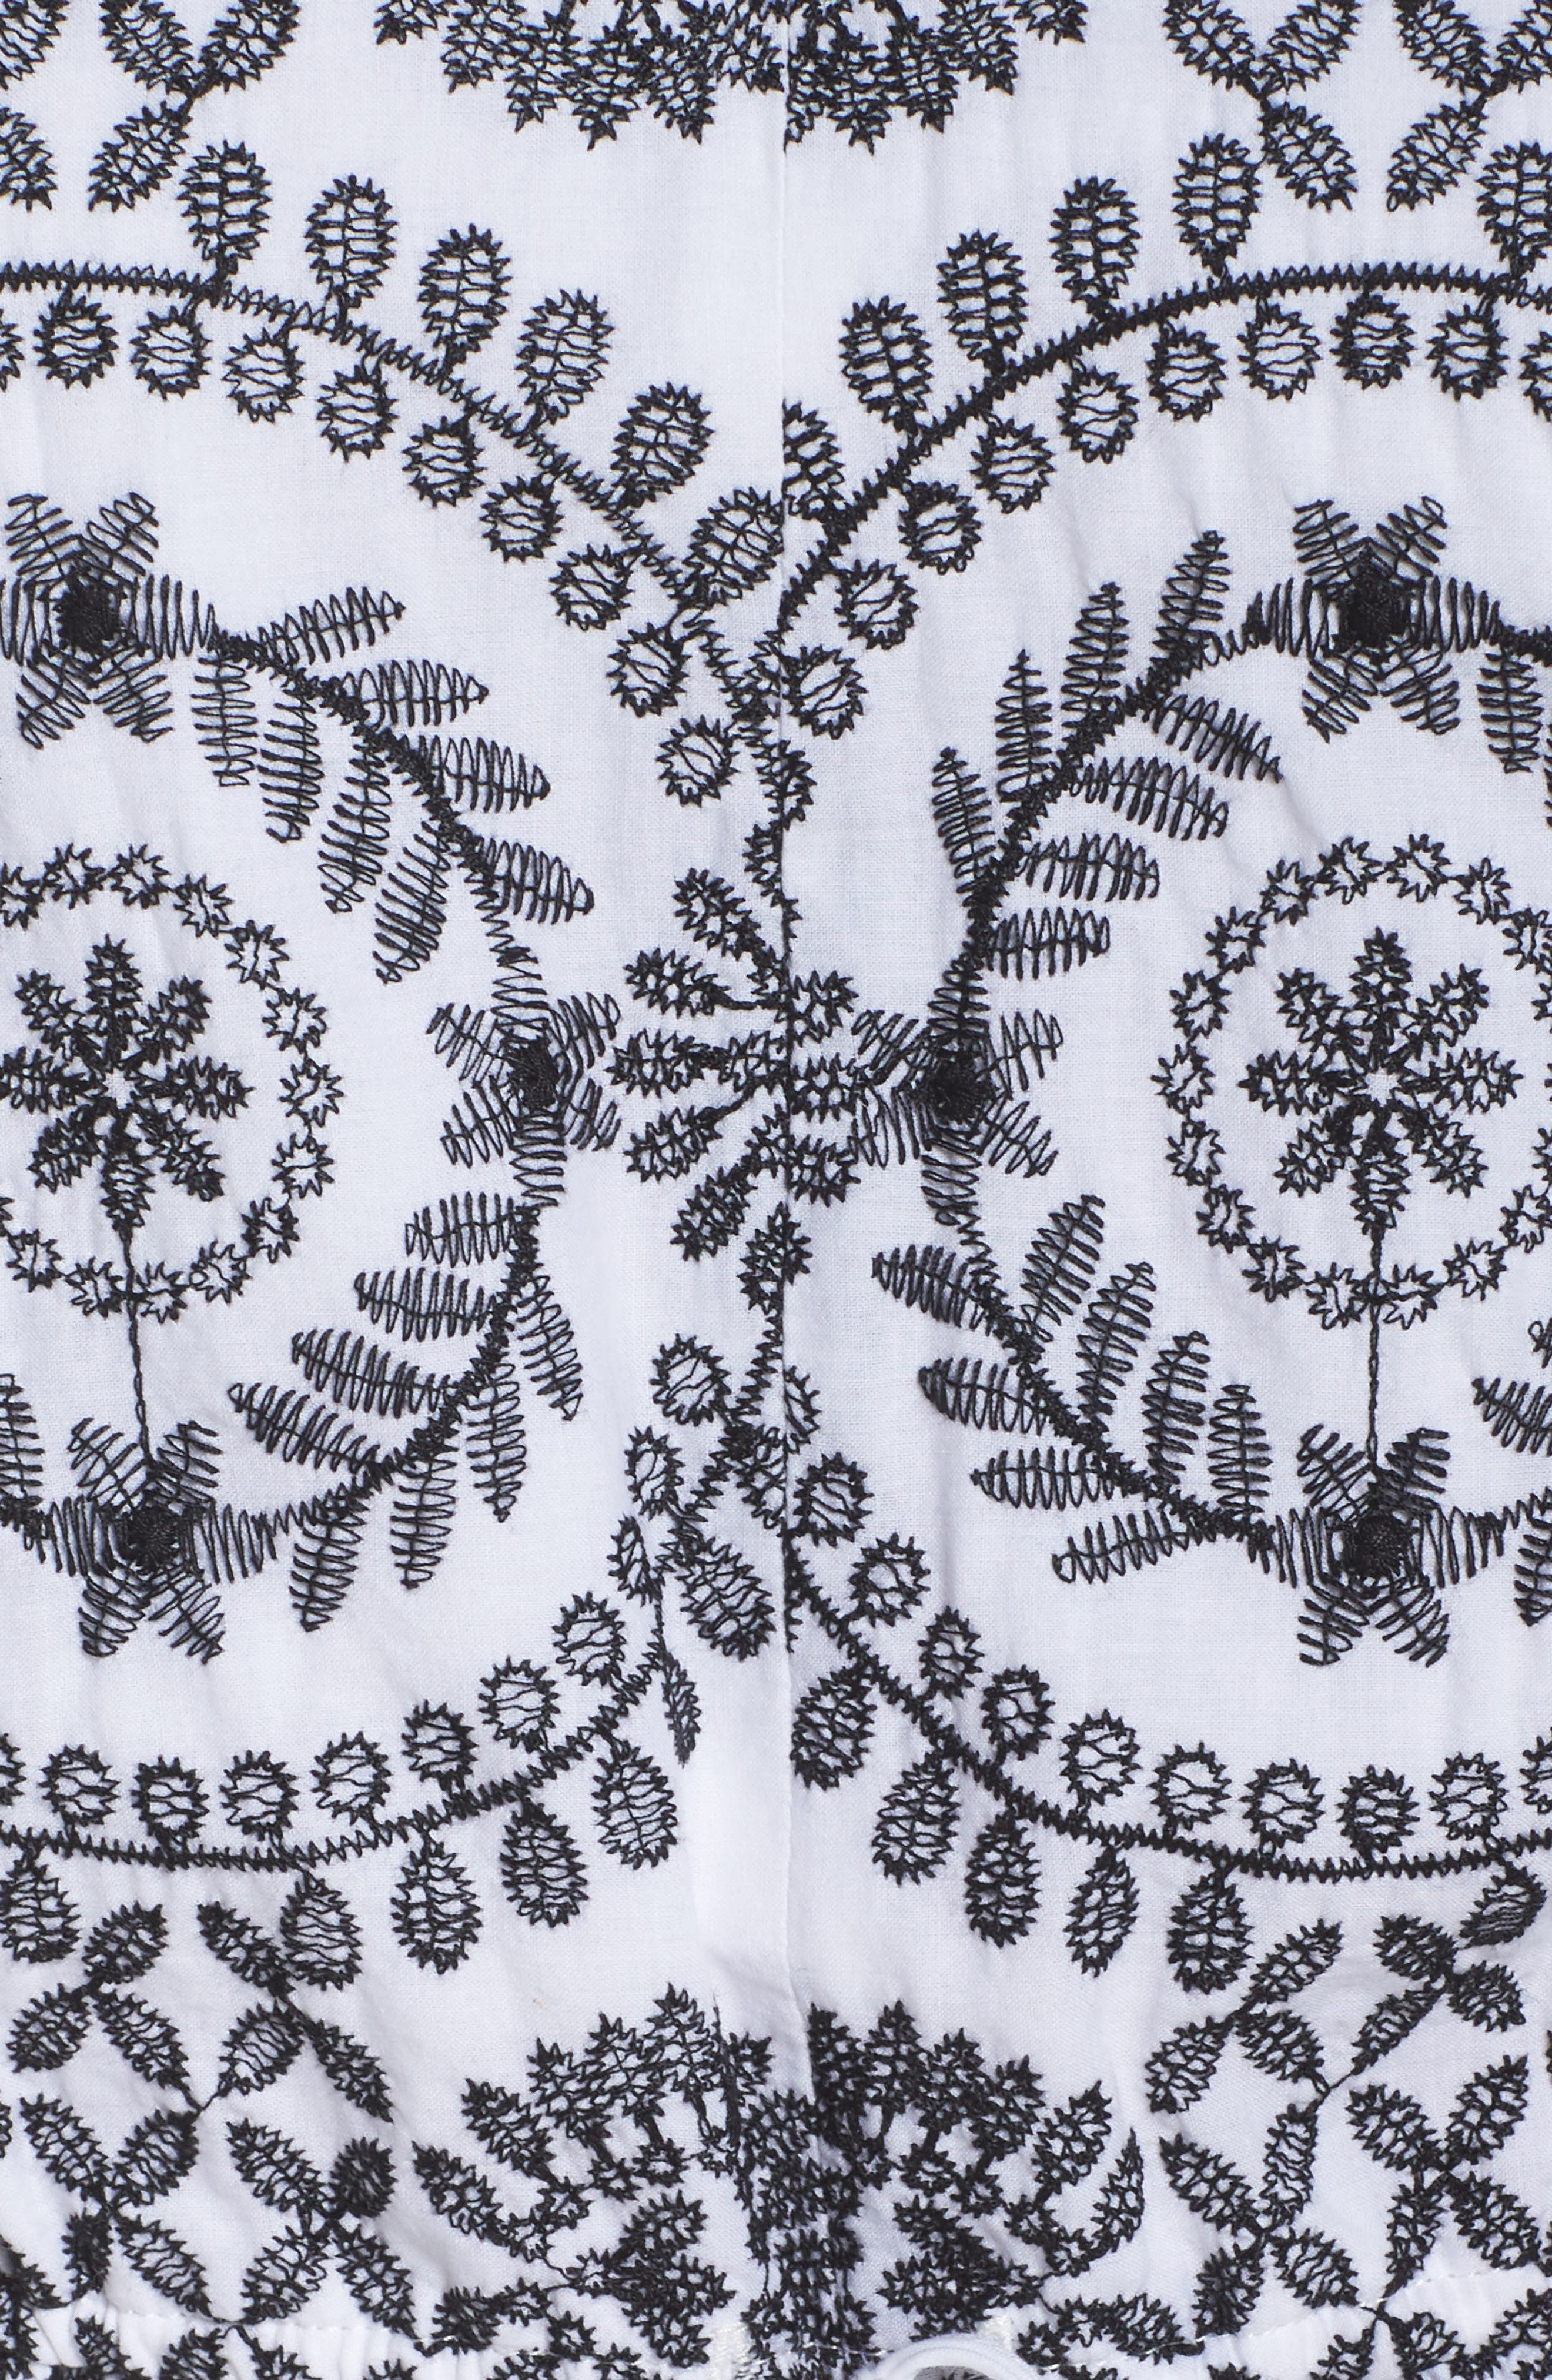 Embroidered Tile Pattern Dress,                             Alternate thumbnail 6, color,